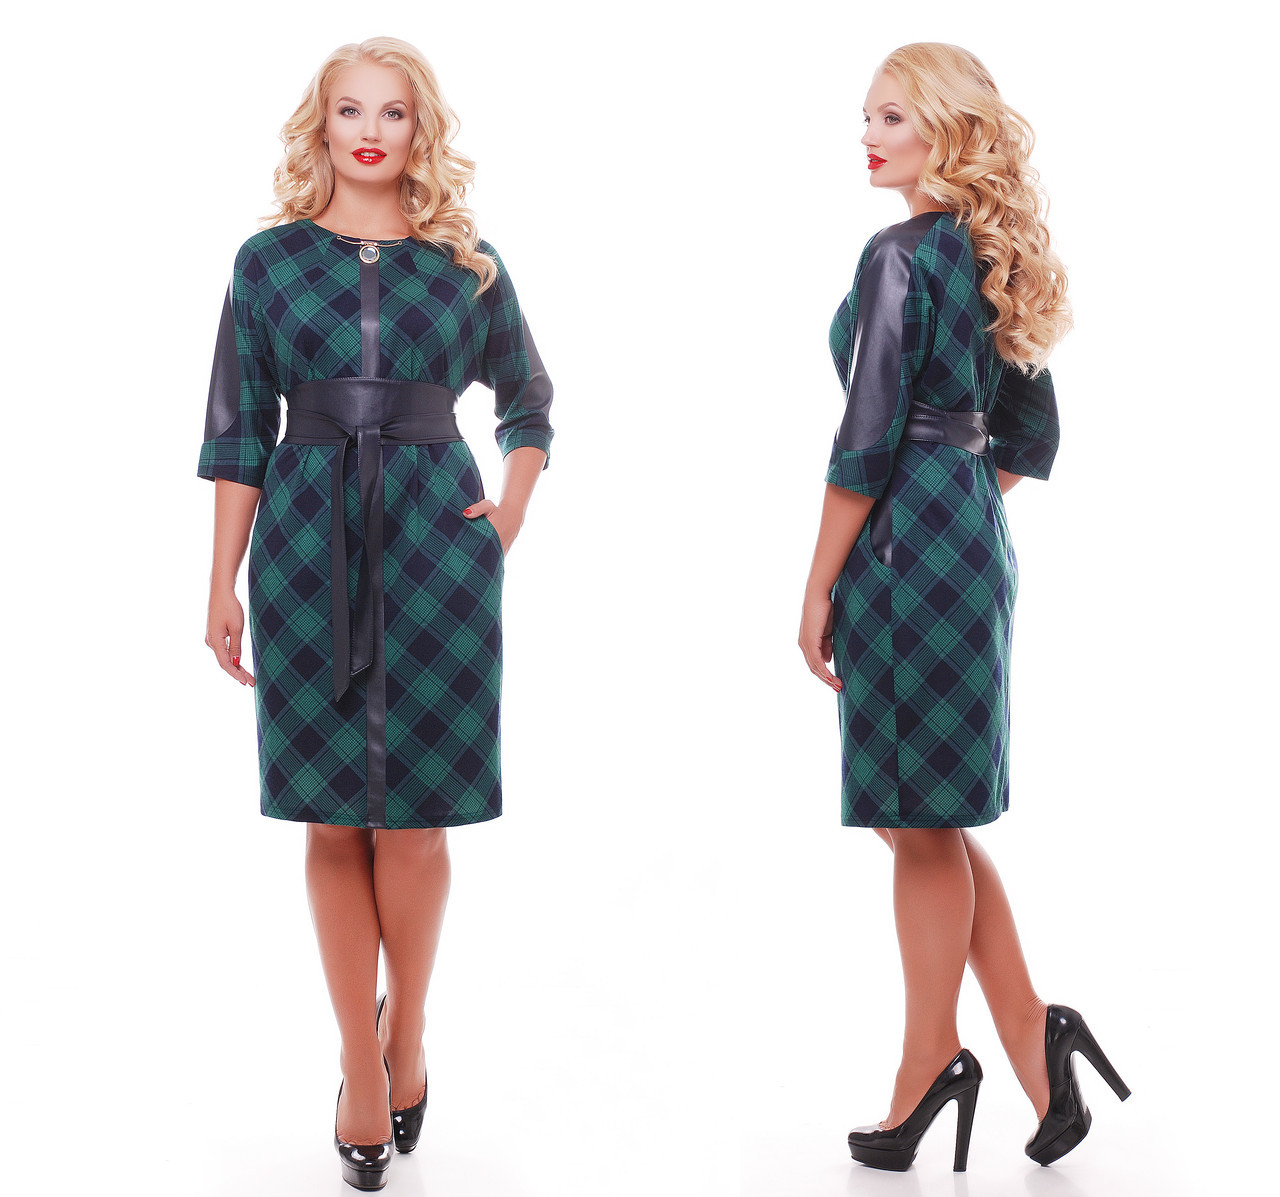 Платье женское  Кэтлин зеленое клетка